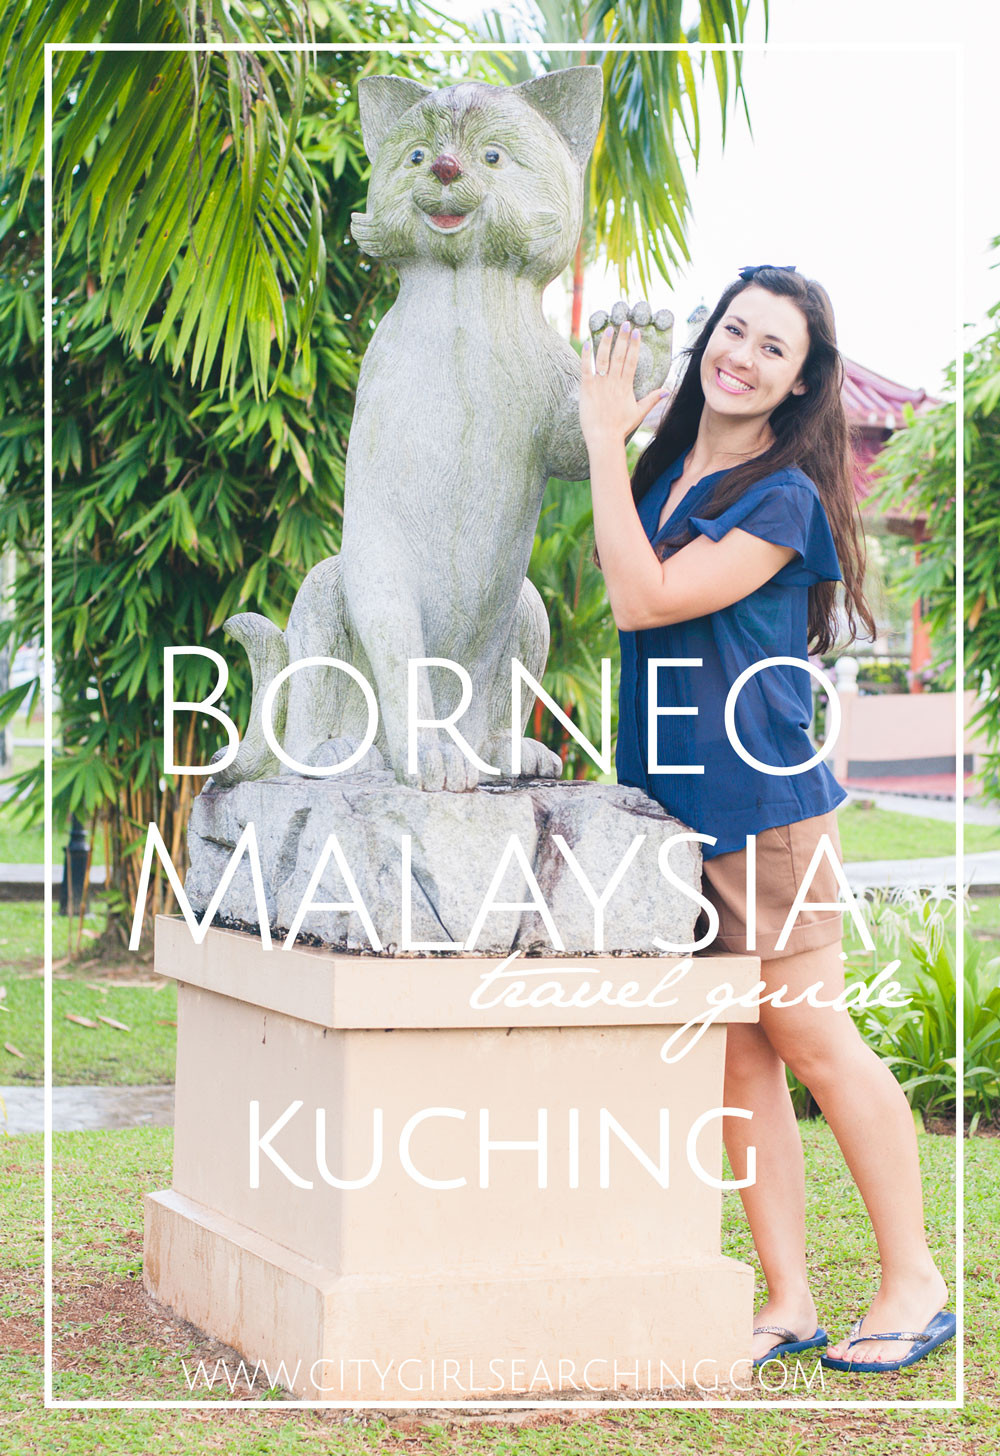 Borneo-Malaysia-Travel-Guide.jpg